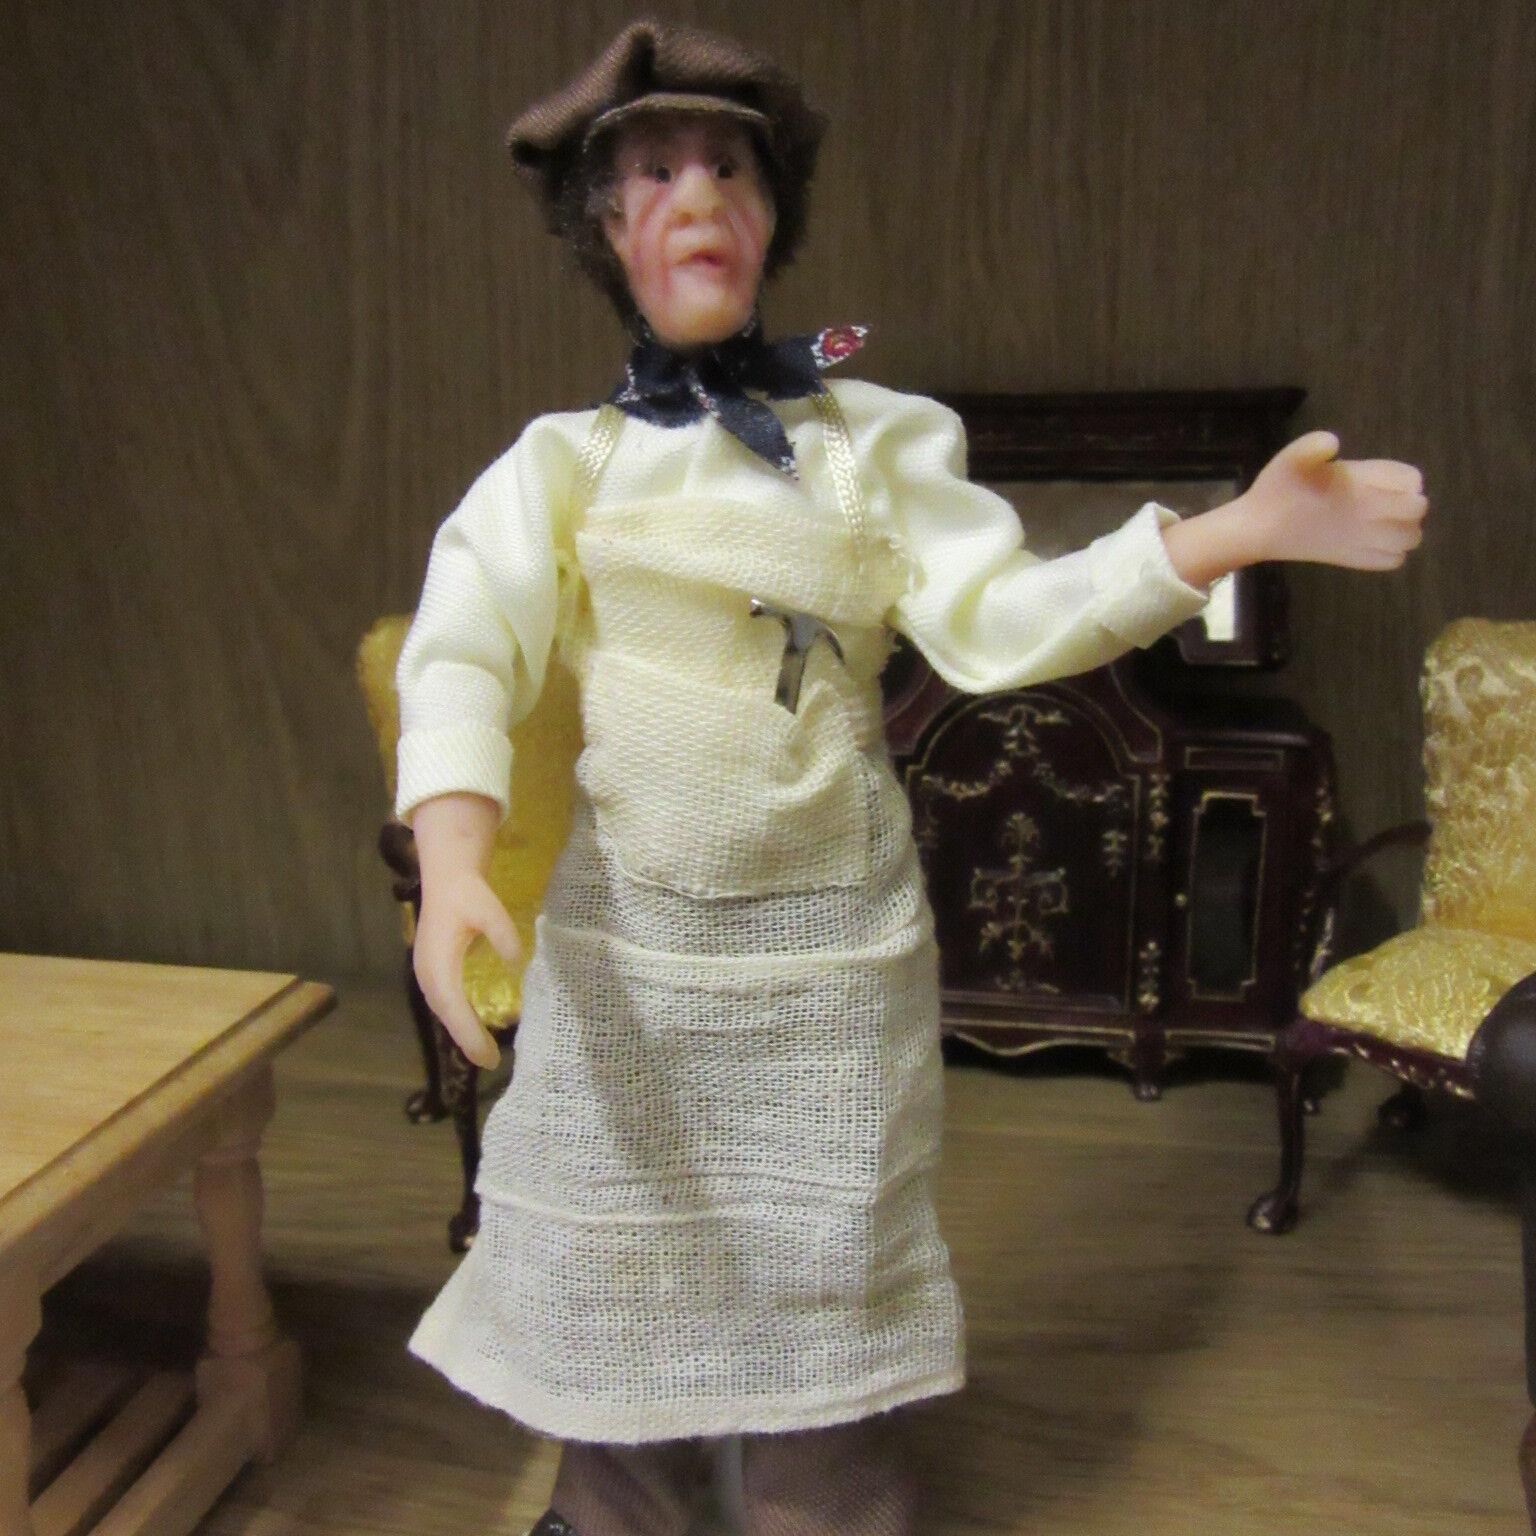 1 12 scale Dolls House Dolls Dolls Dolls Workman Carpenter 2bc029